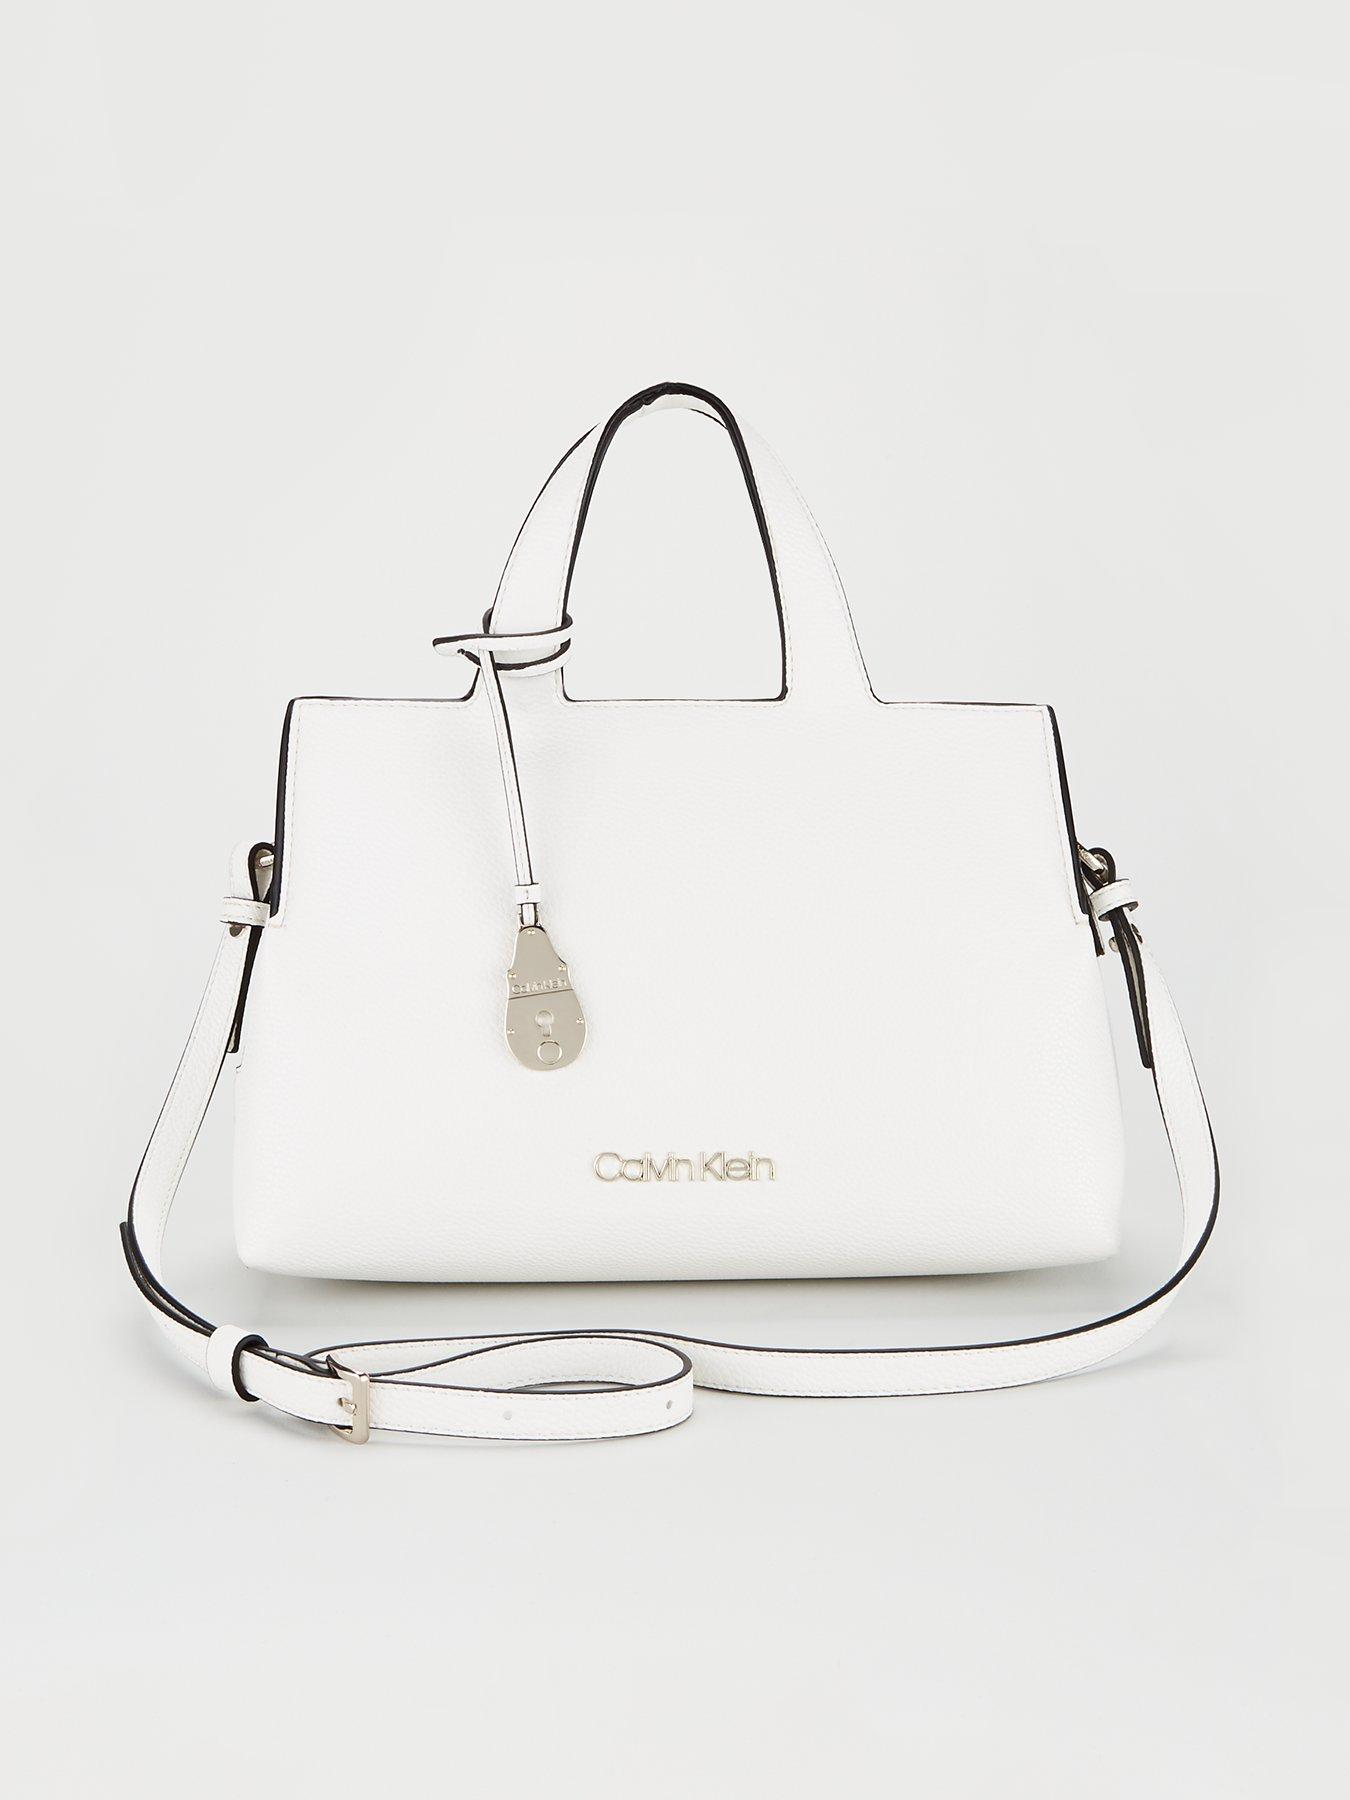 Ck calvin Bags for Women, compare